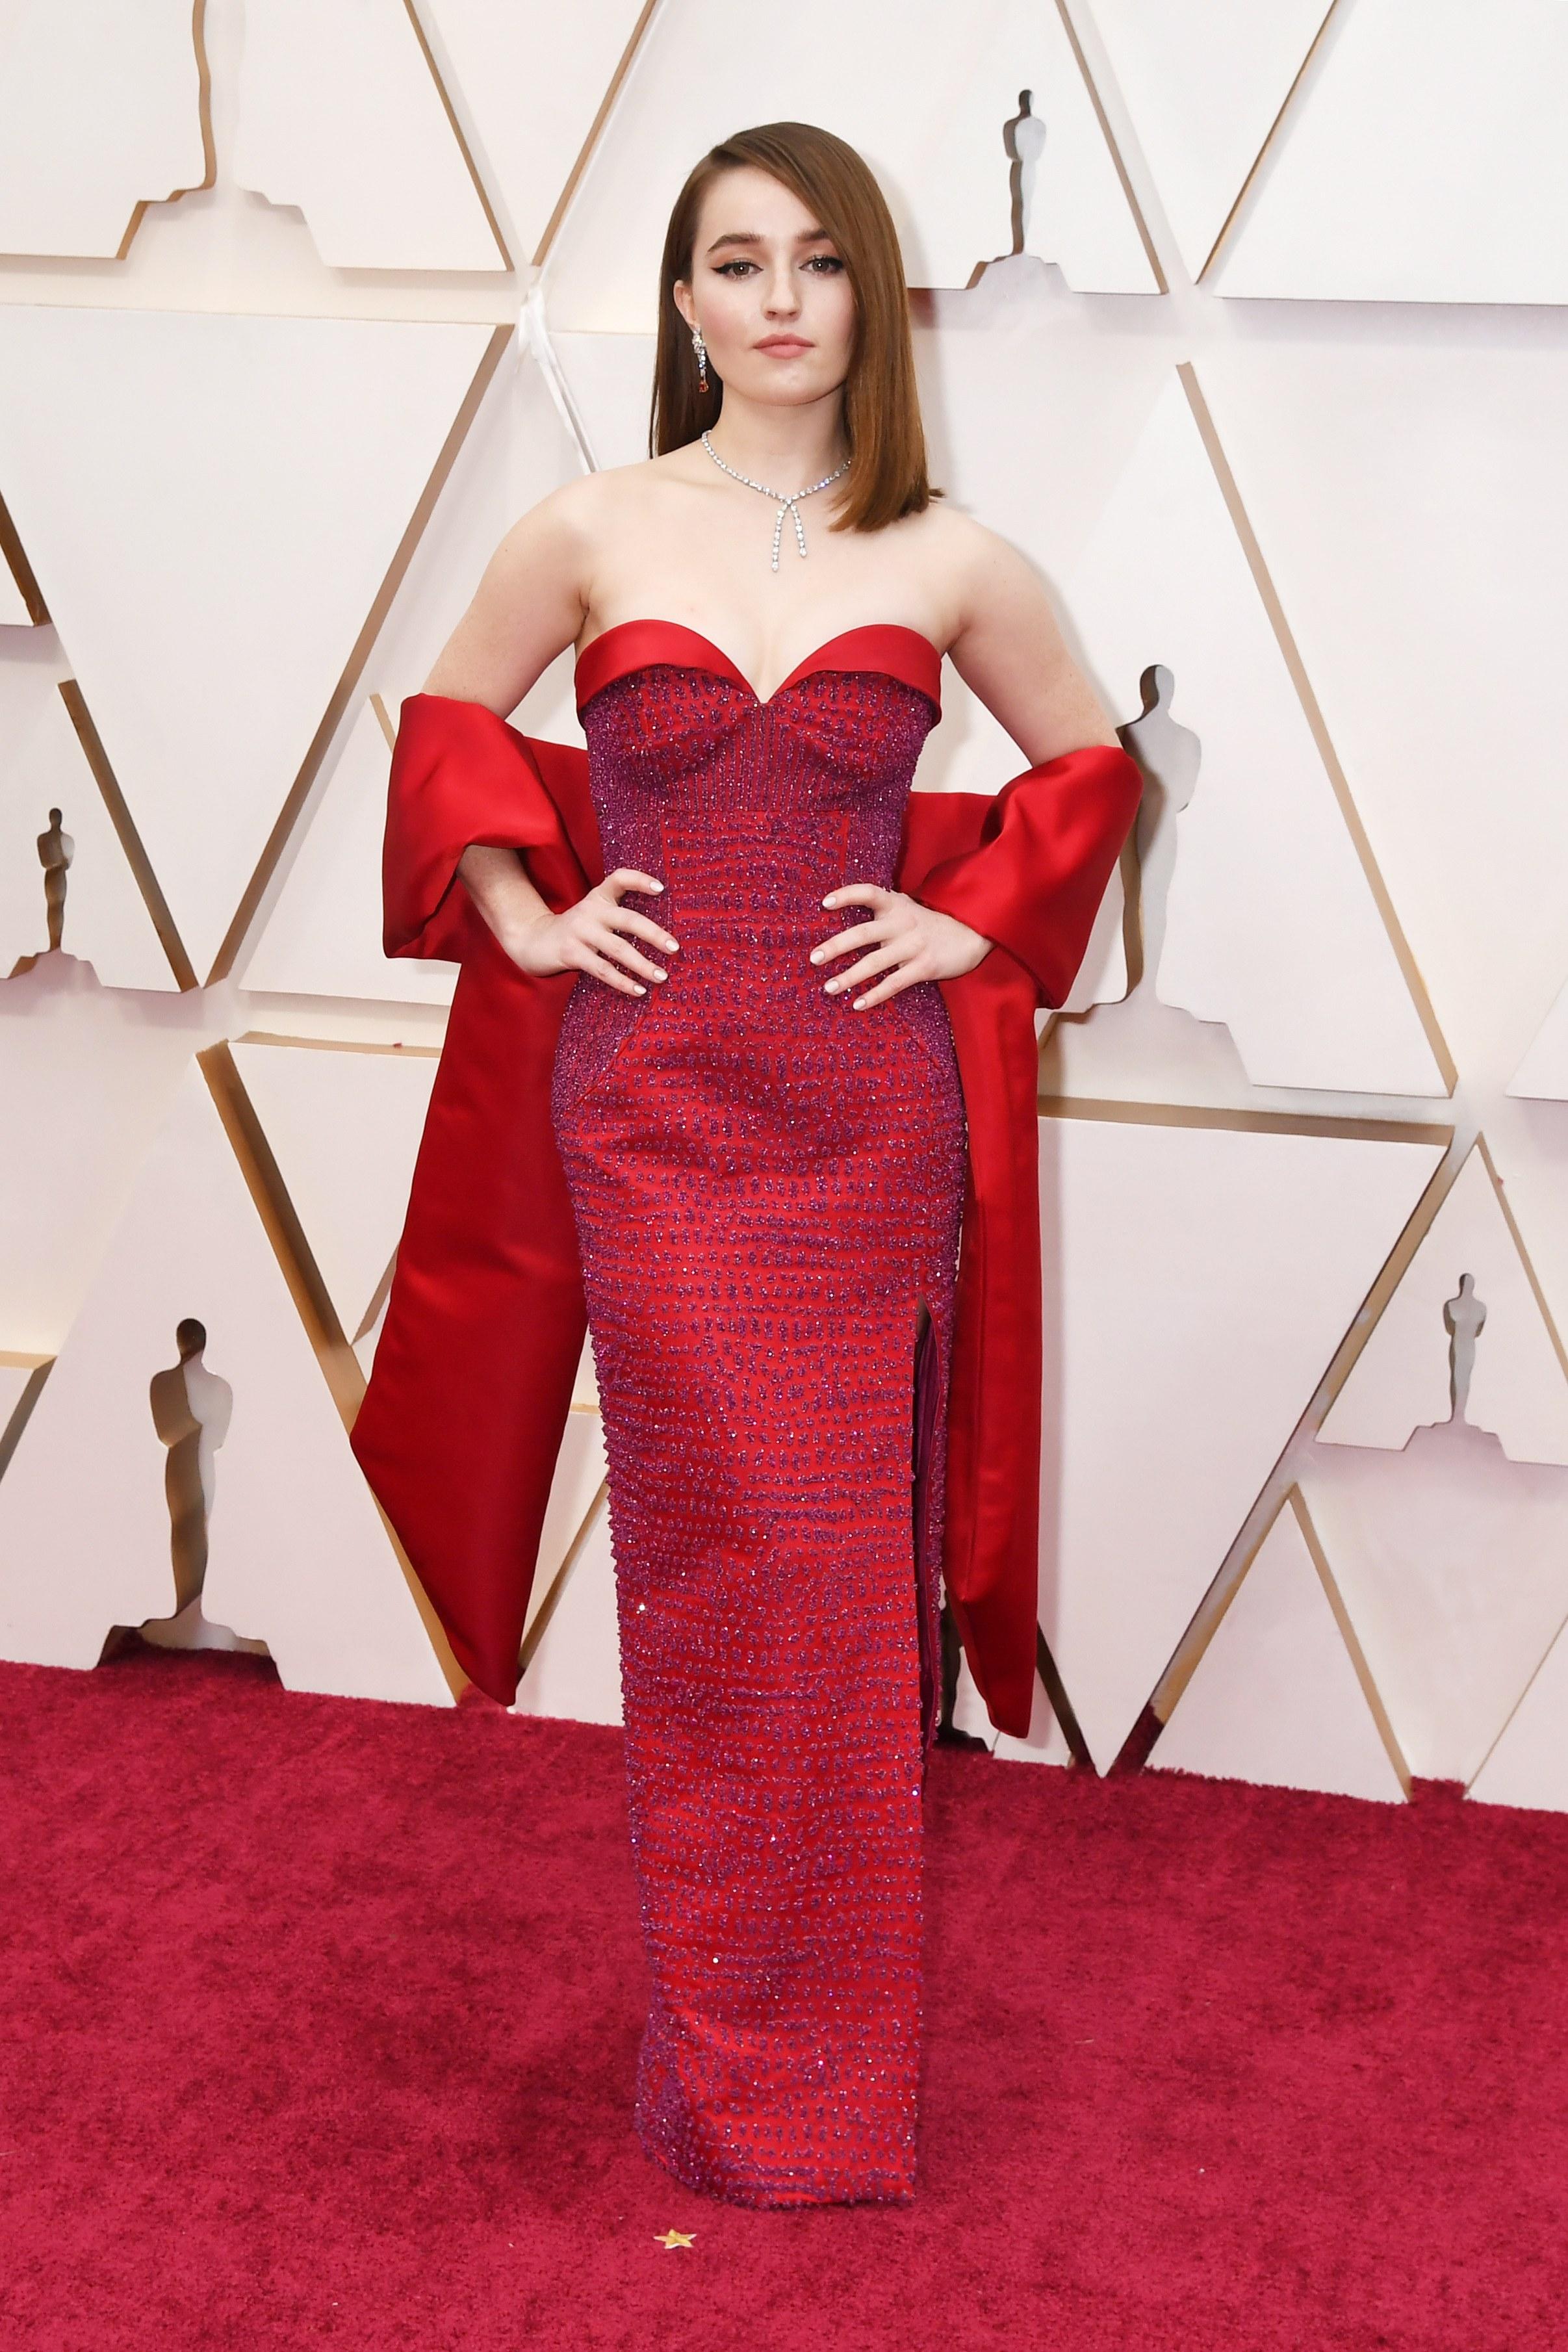 thảm đỏ oscar 2020 Kaitlin Dever đầm quây đỏ Louis Vuitton